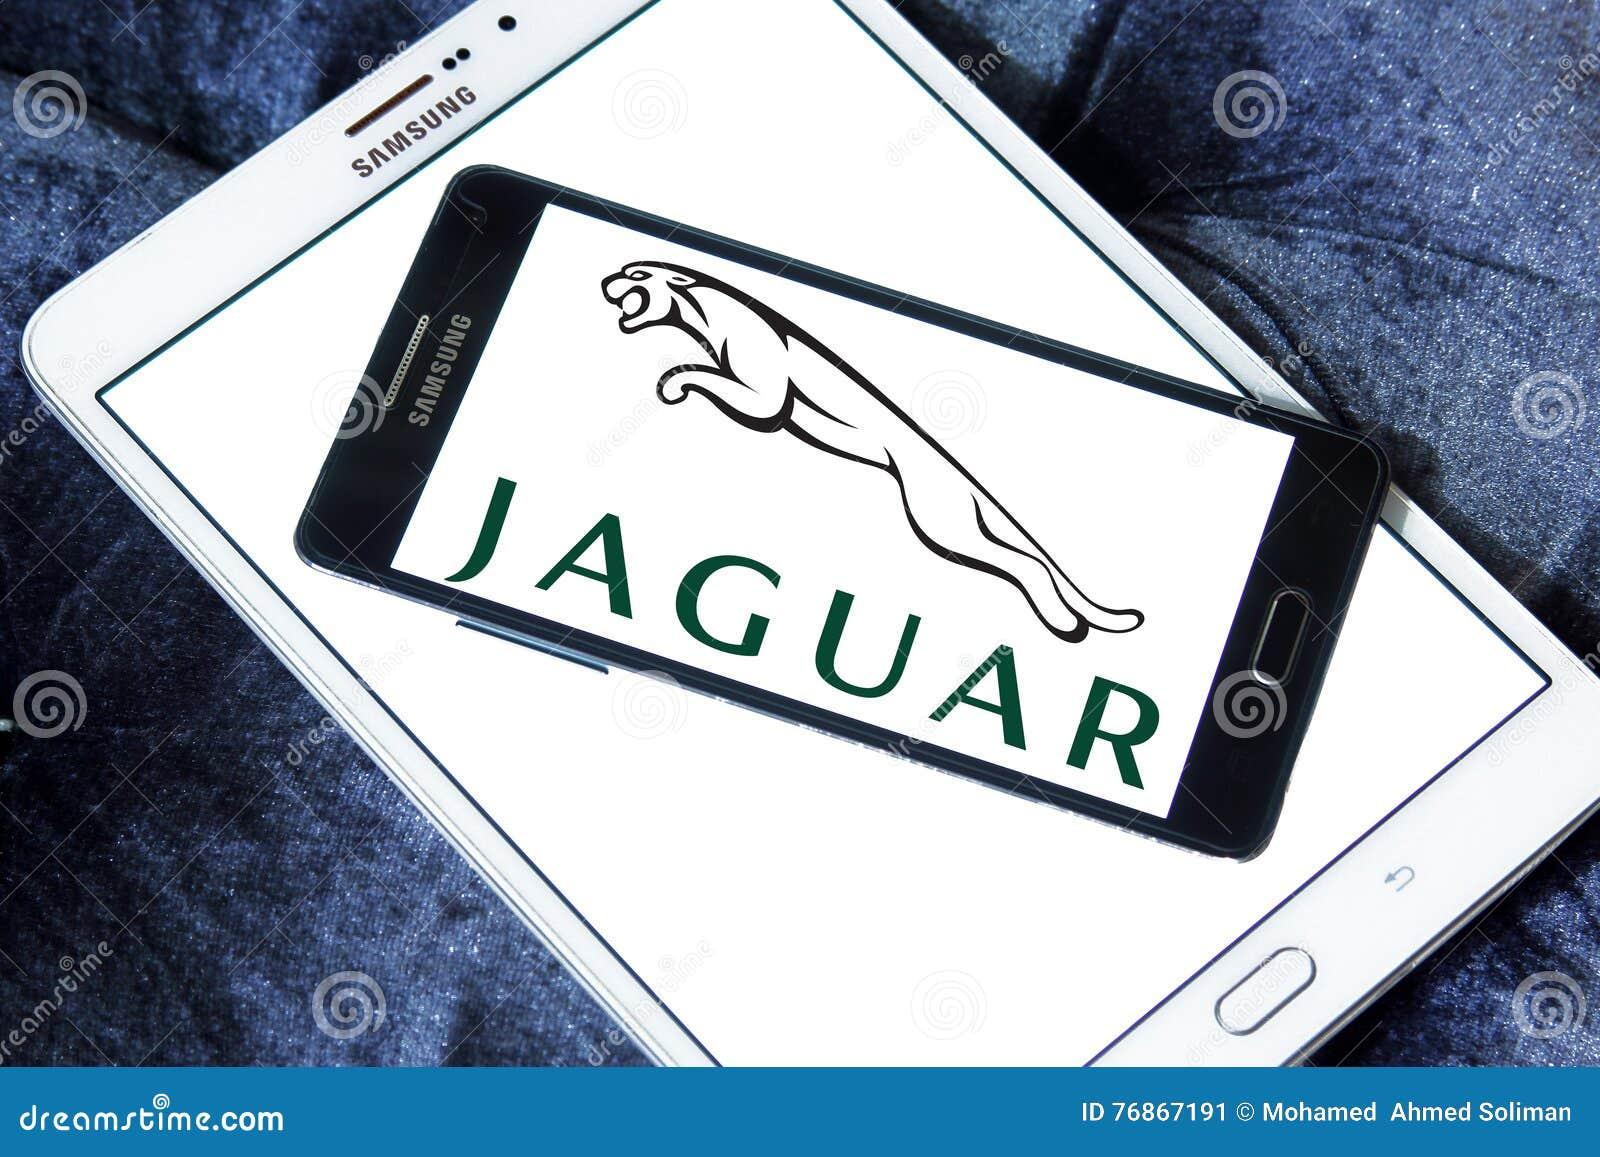 Jaguar Car Logo Editorial Photo Image Of Logos Transportation